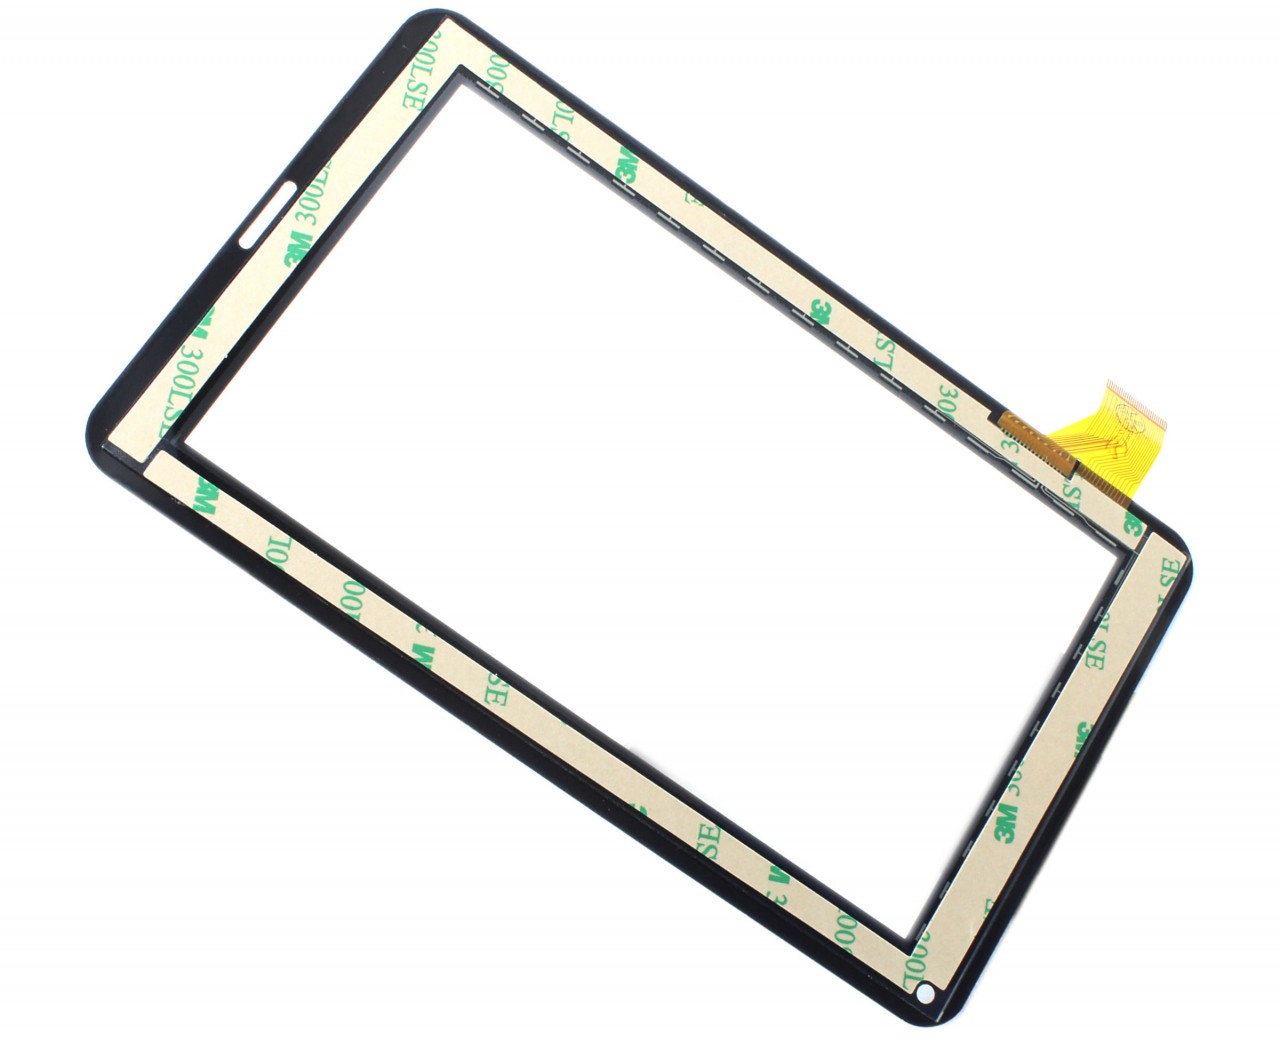 Touchscreen Digitizer Vinchi Smartplay V7A Geam Sticla Tableta imagine powerlaptop.ro 2021